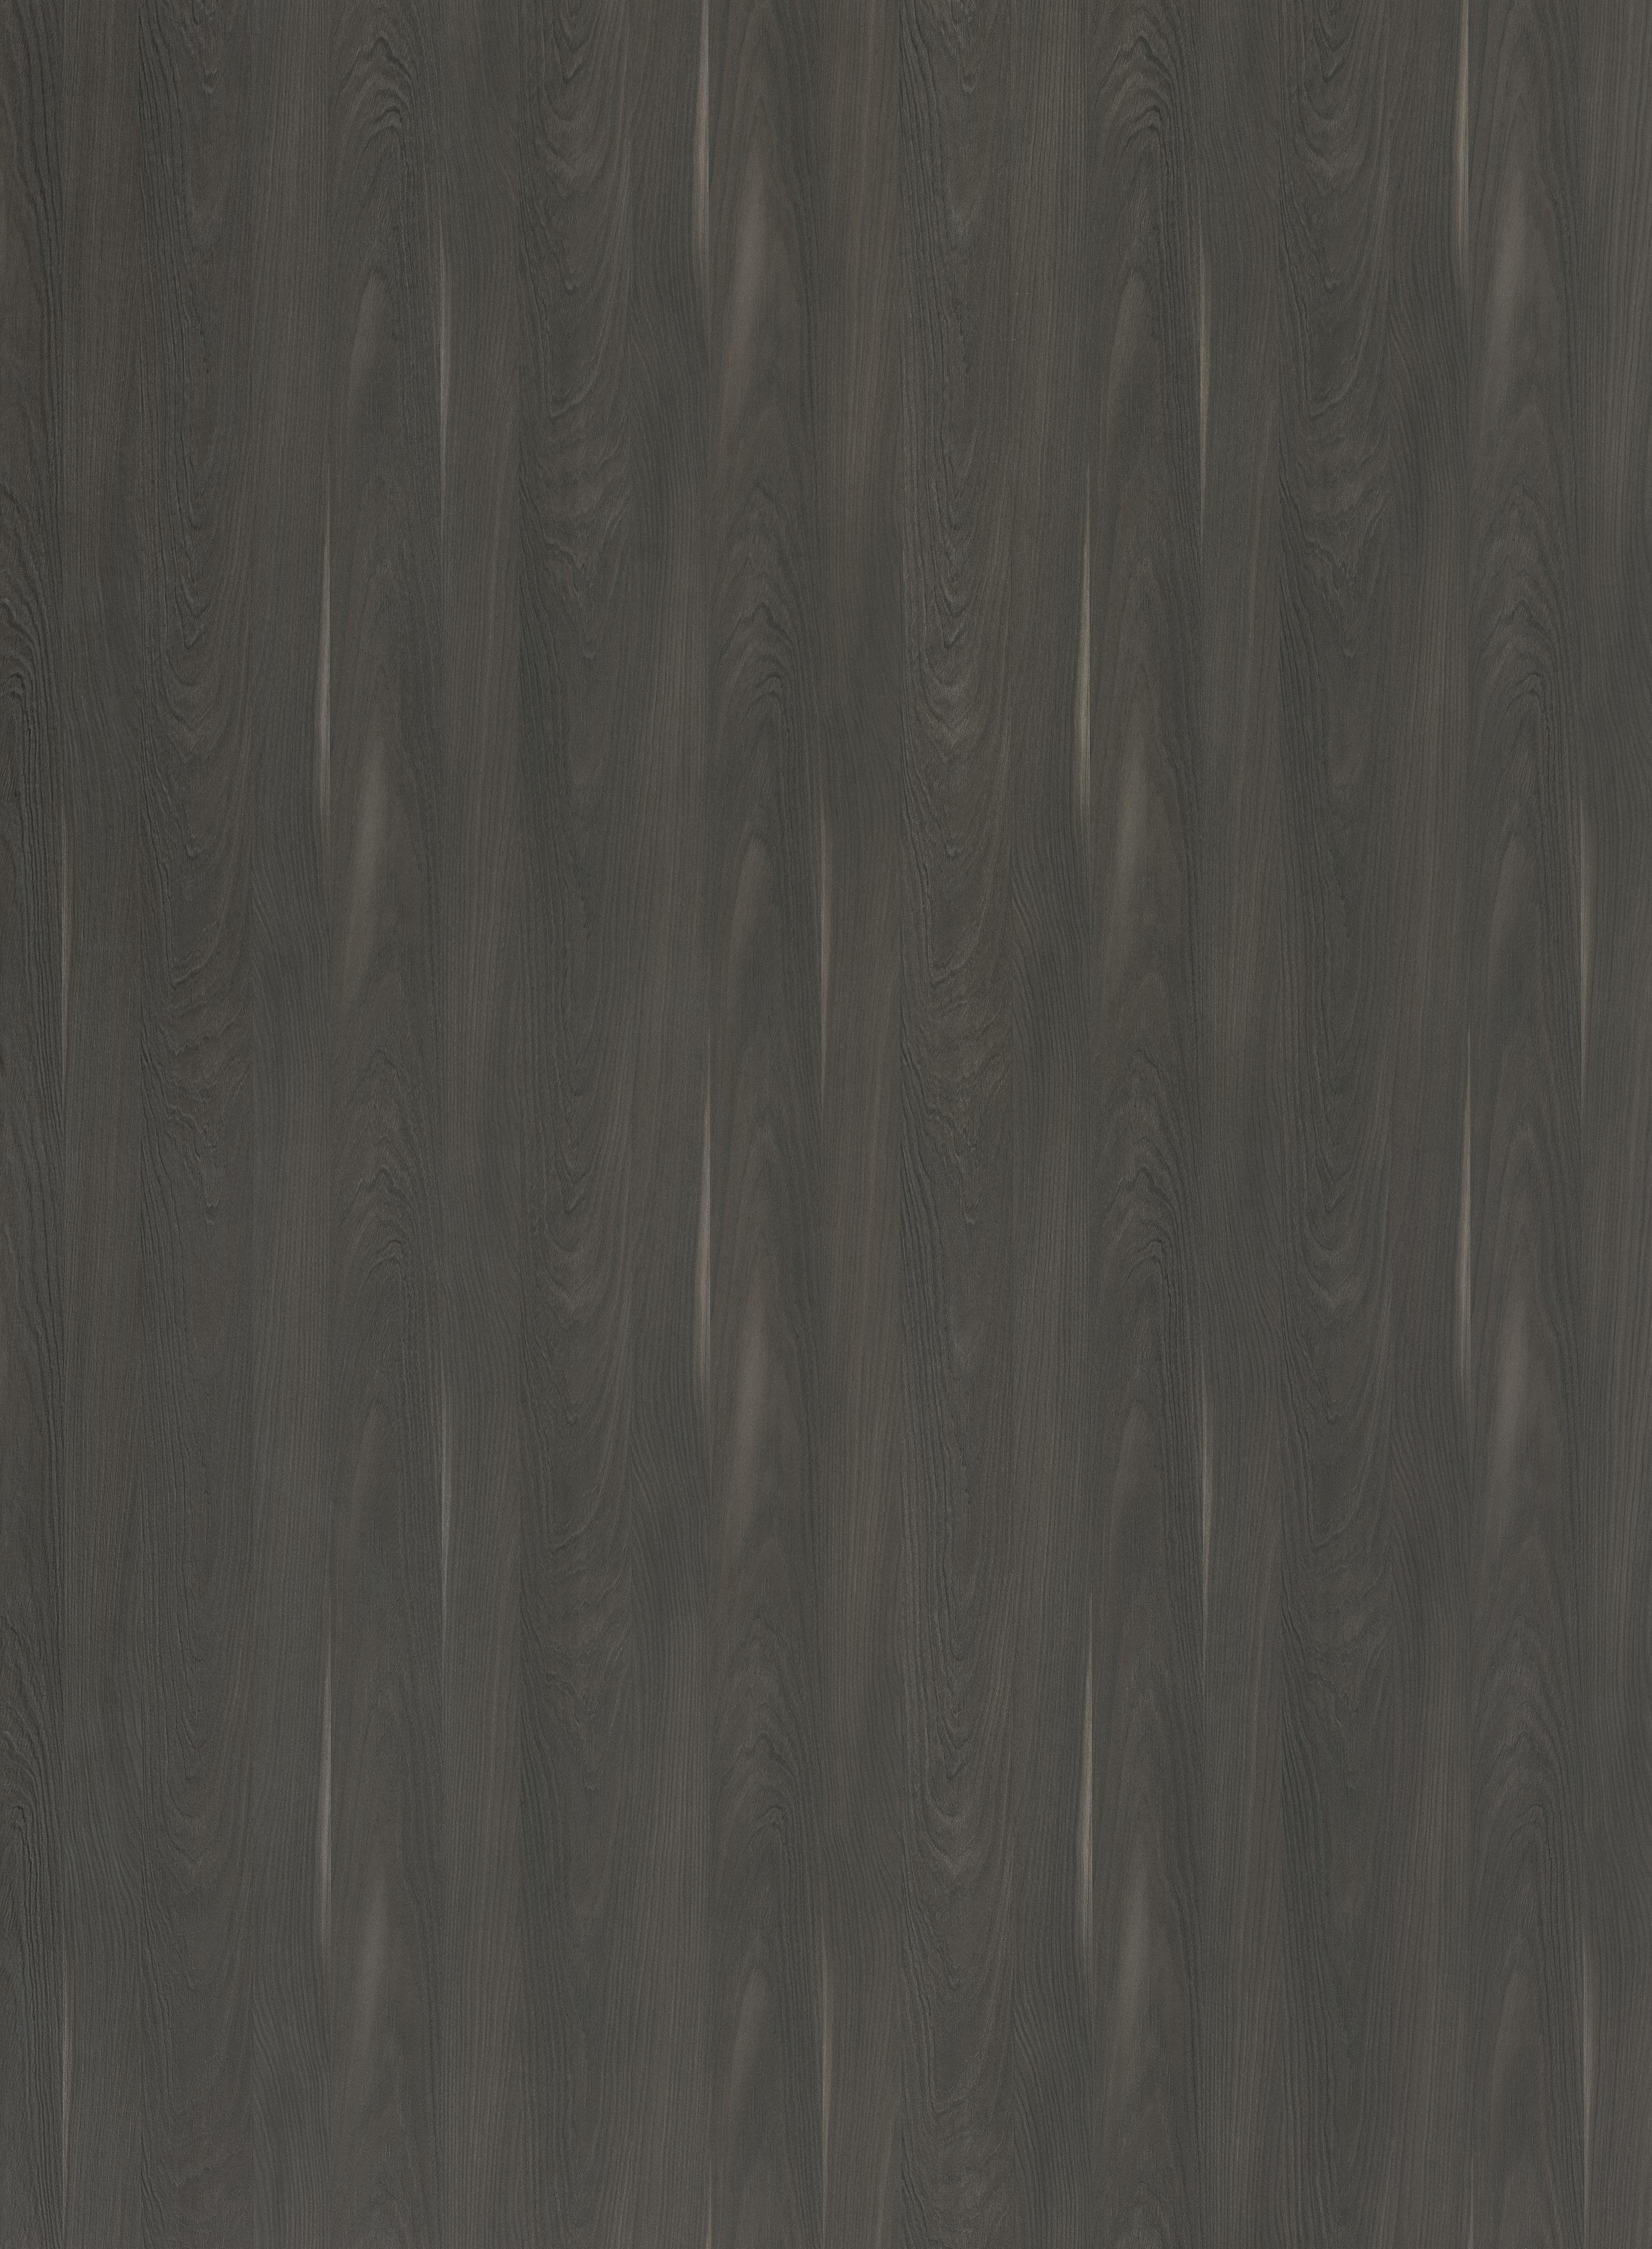 DecoLegno CLEAF, S015 Yosemite, hele plaat afb. 2800x2070m/Tekenprogramma